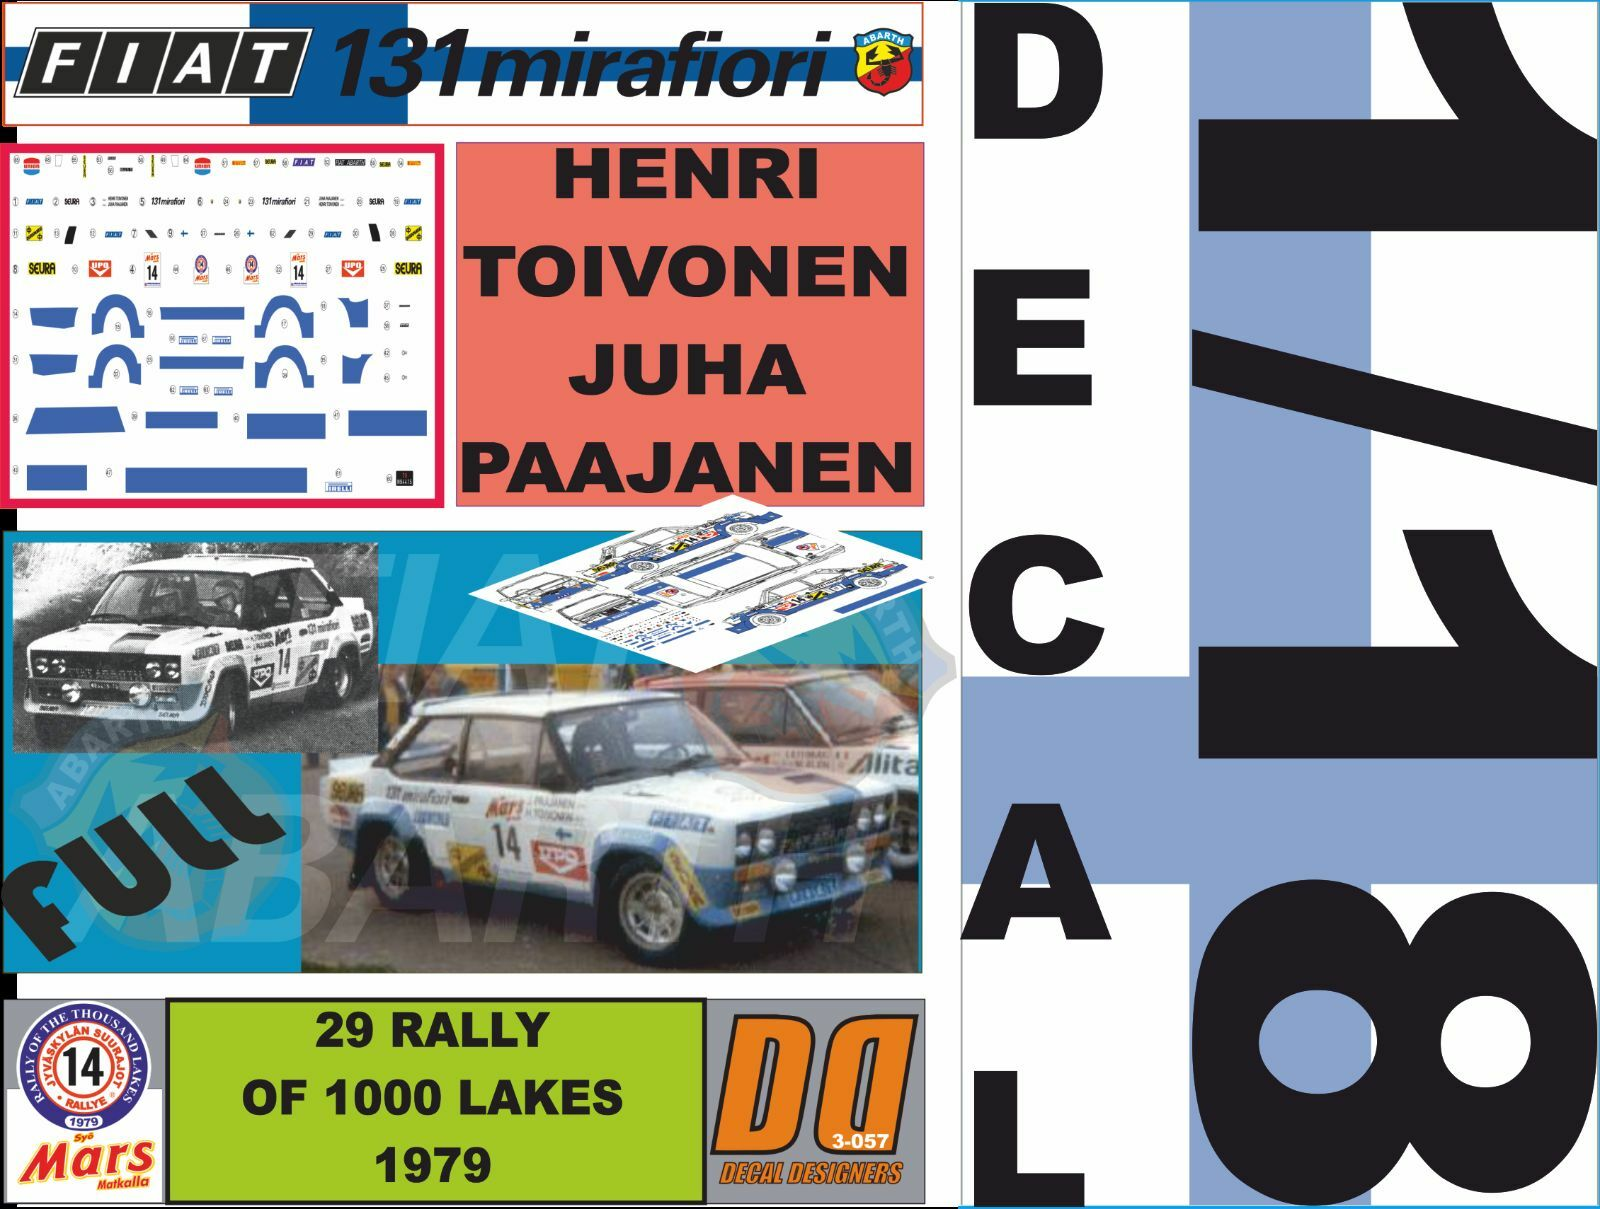 Decal 1 18 fiat 131 abarth H. toivonen 1000 lakes 1979 (Full) (01)